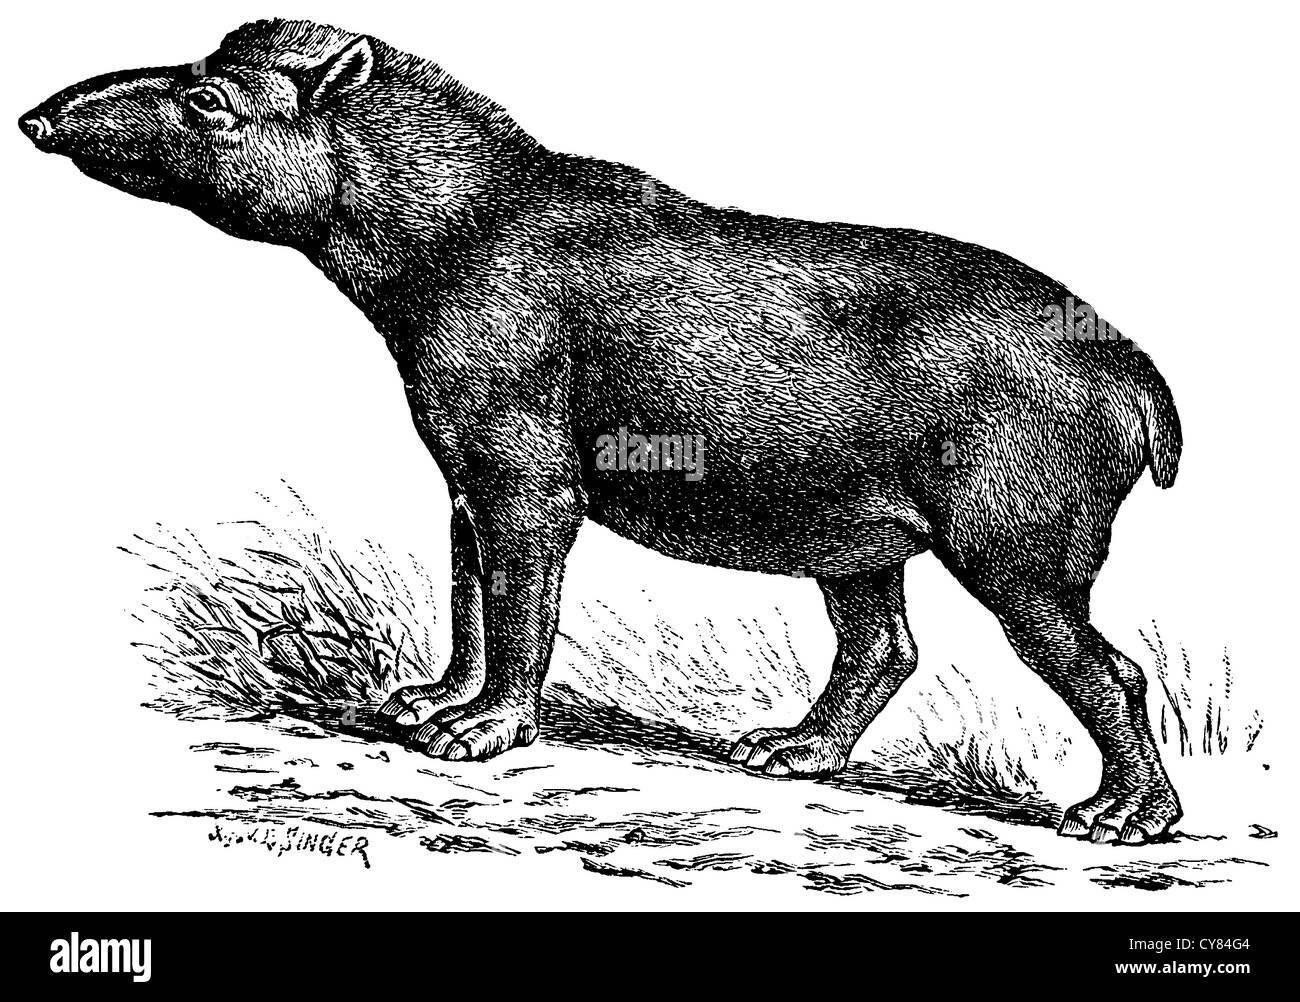 Tapiro americano Immagini Stock